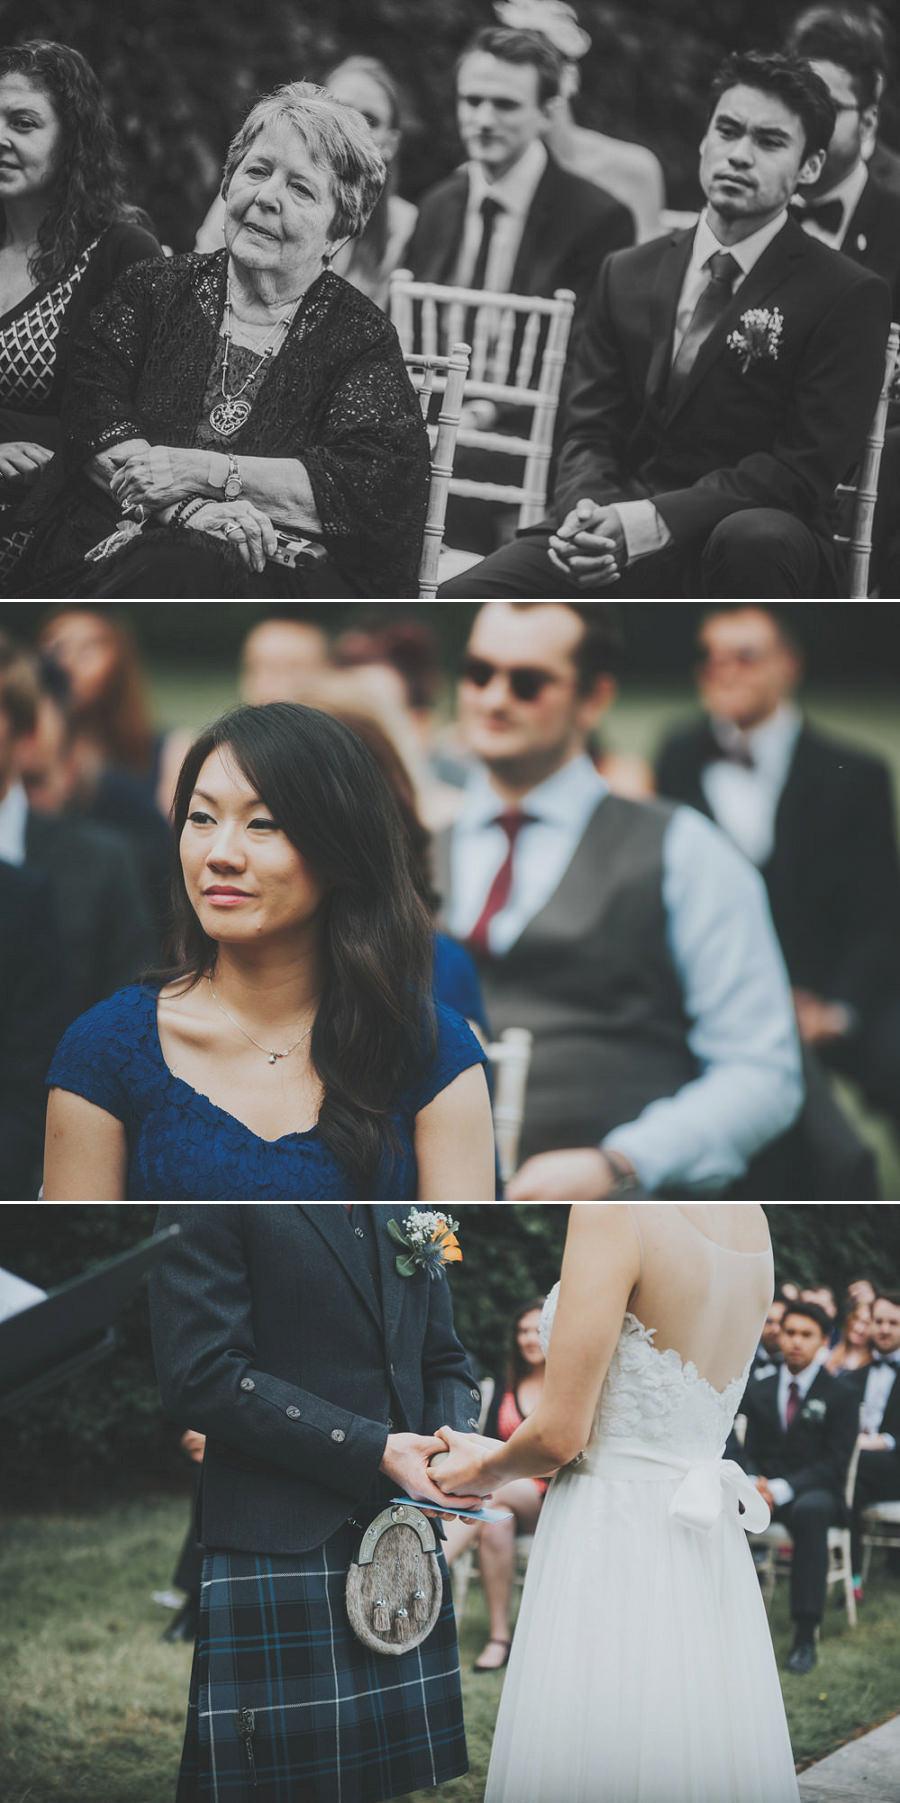 scottish-wedding-photography-vintage-photographer-021.jpg